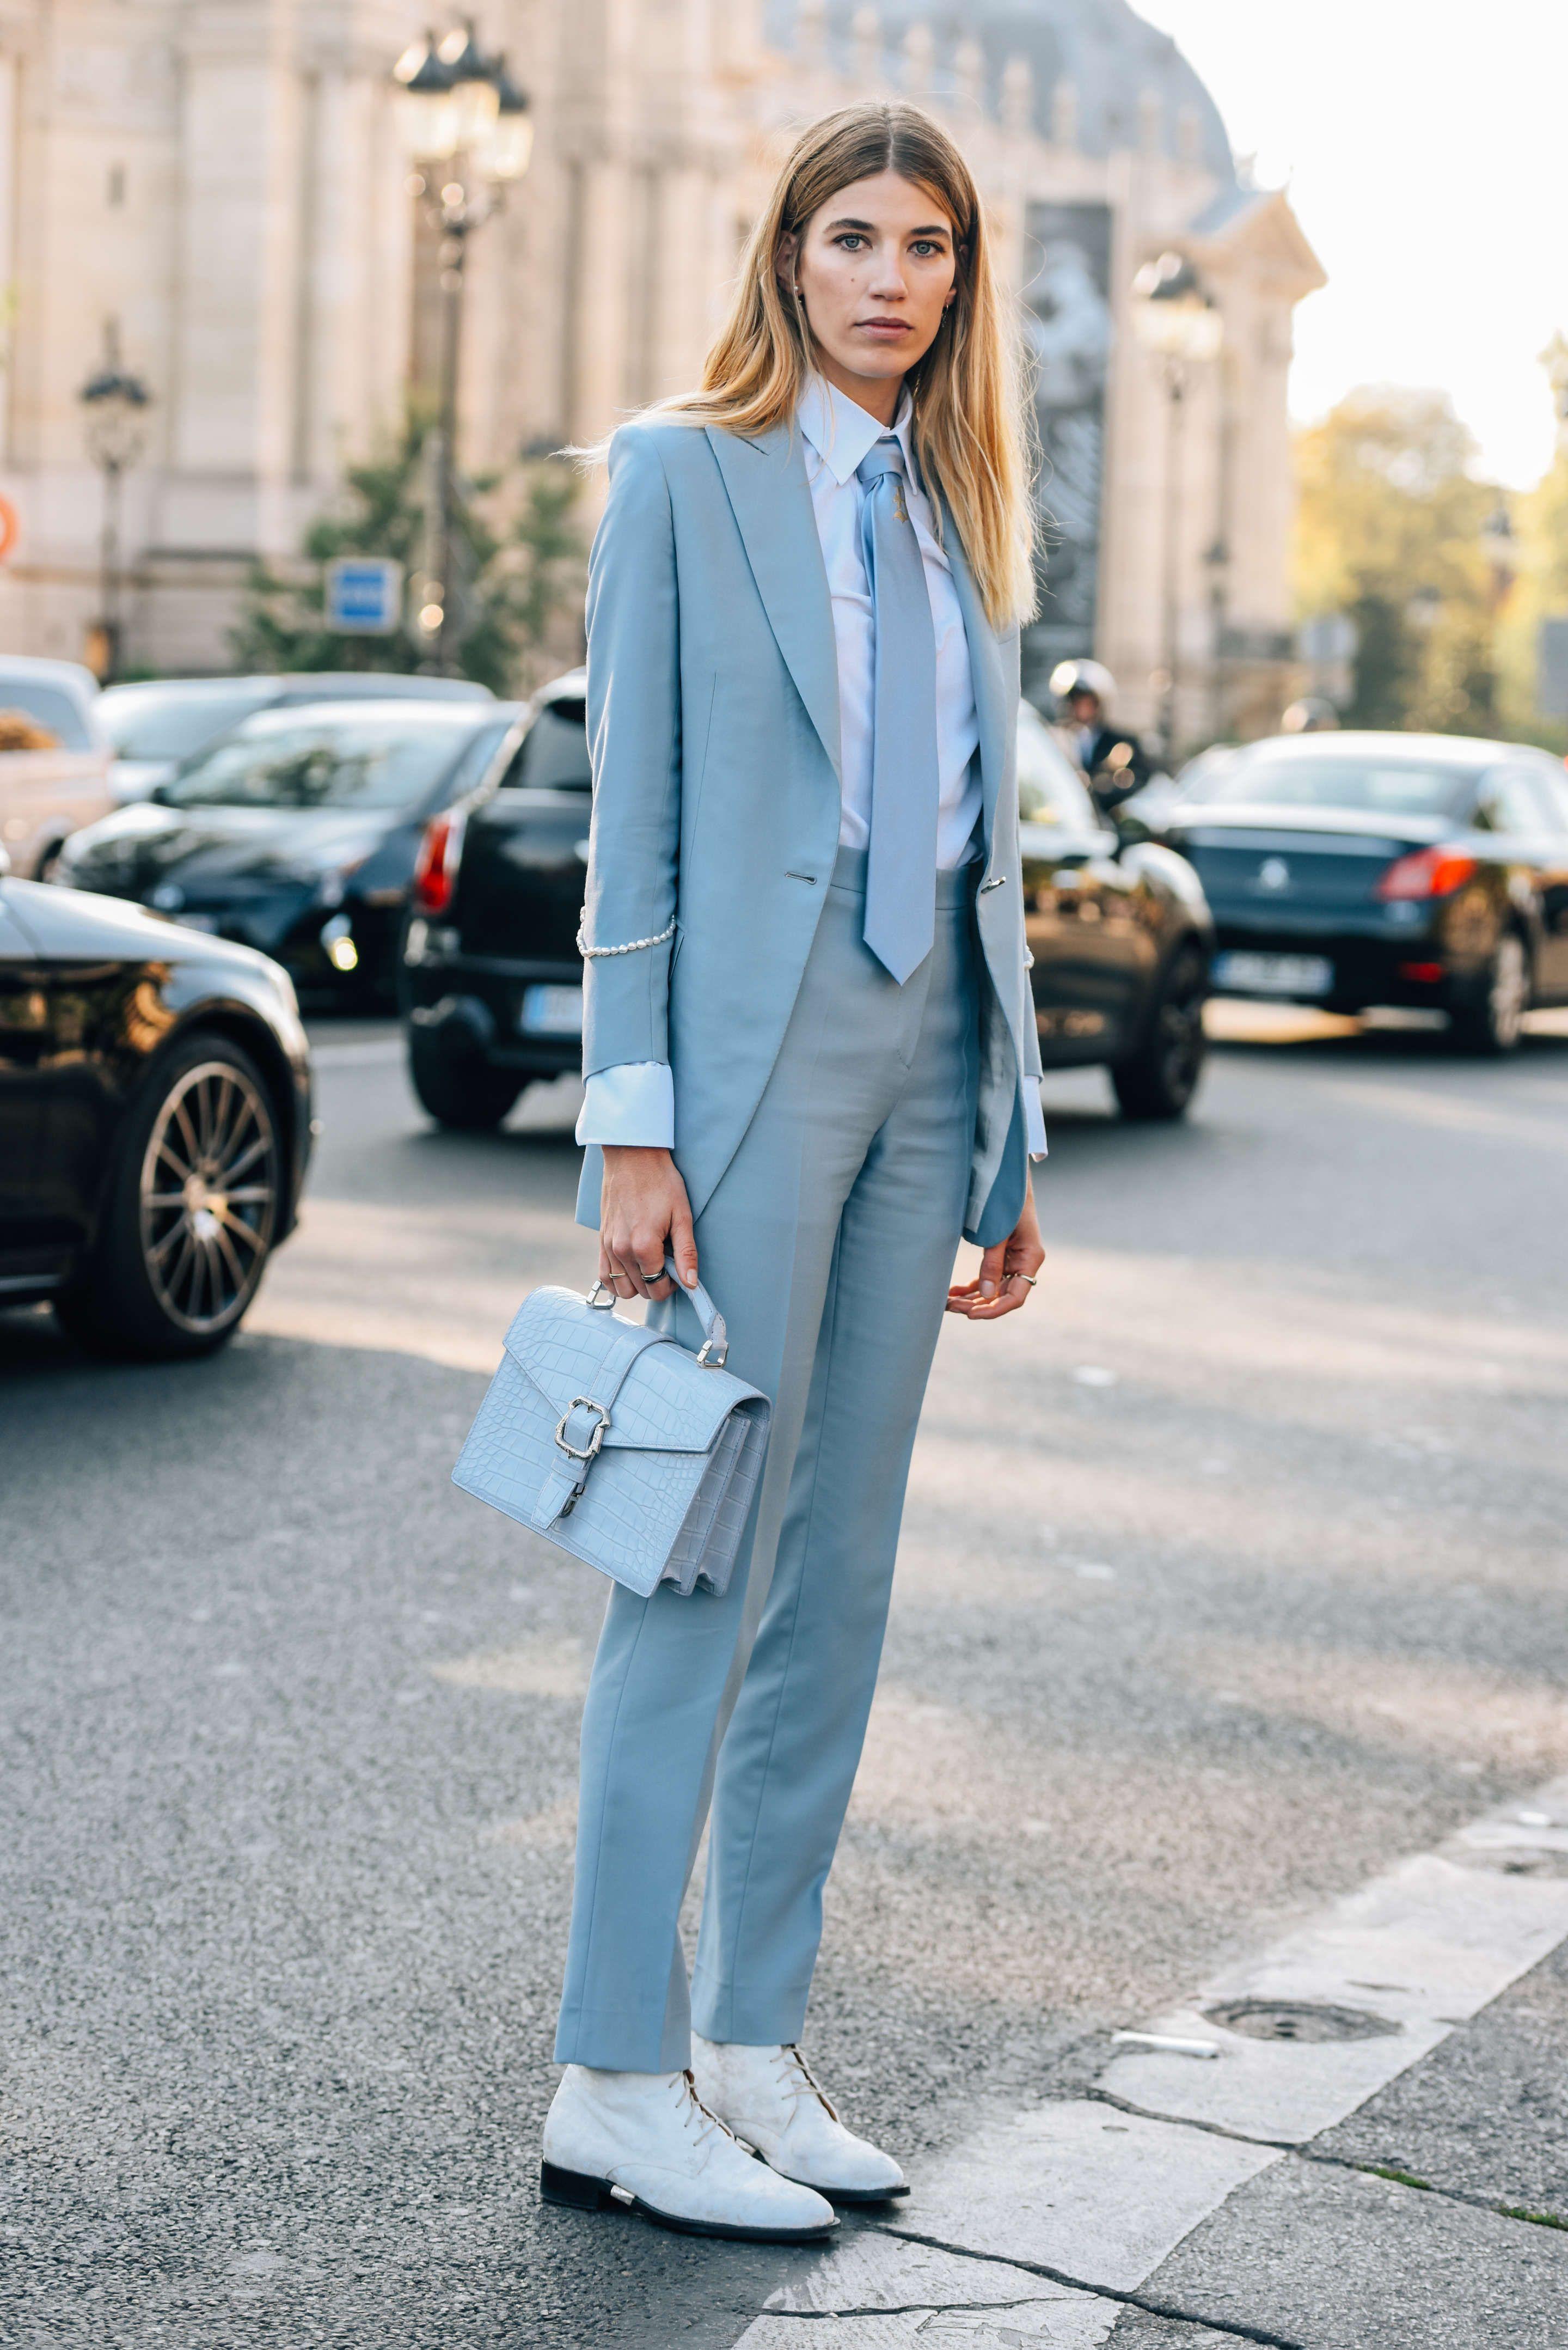 Streetstyle | Fashion | Suit up | Blue babe | More on Fashionchick ...